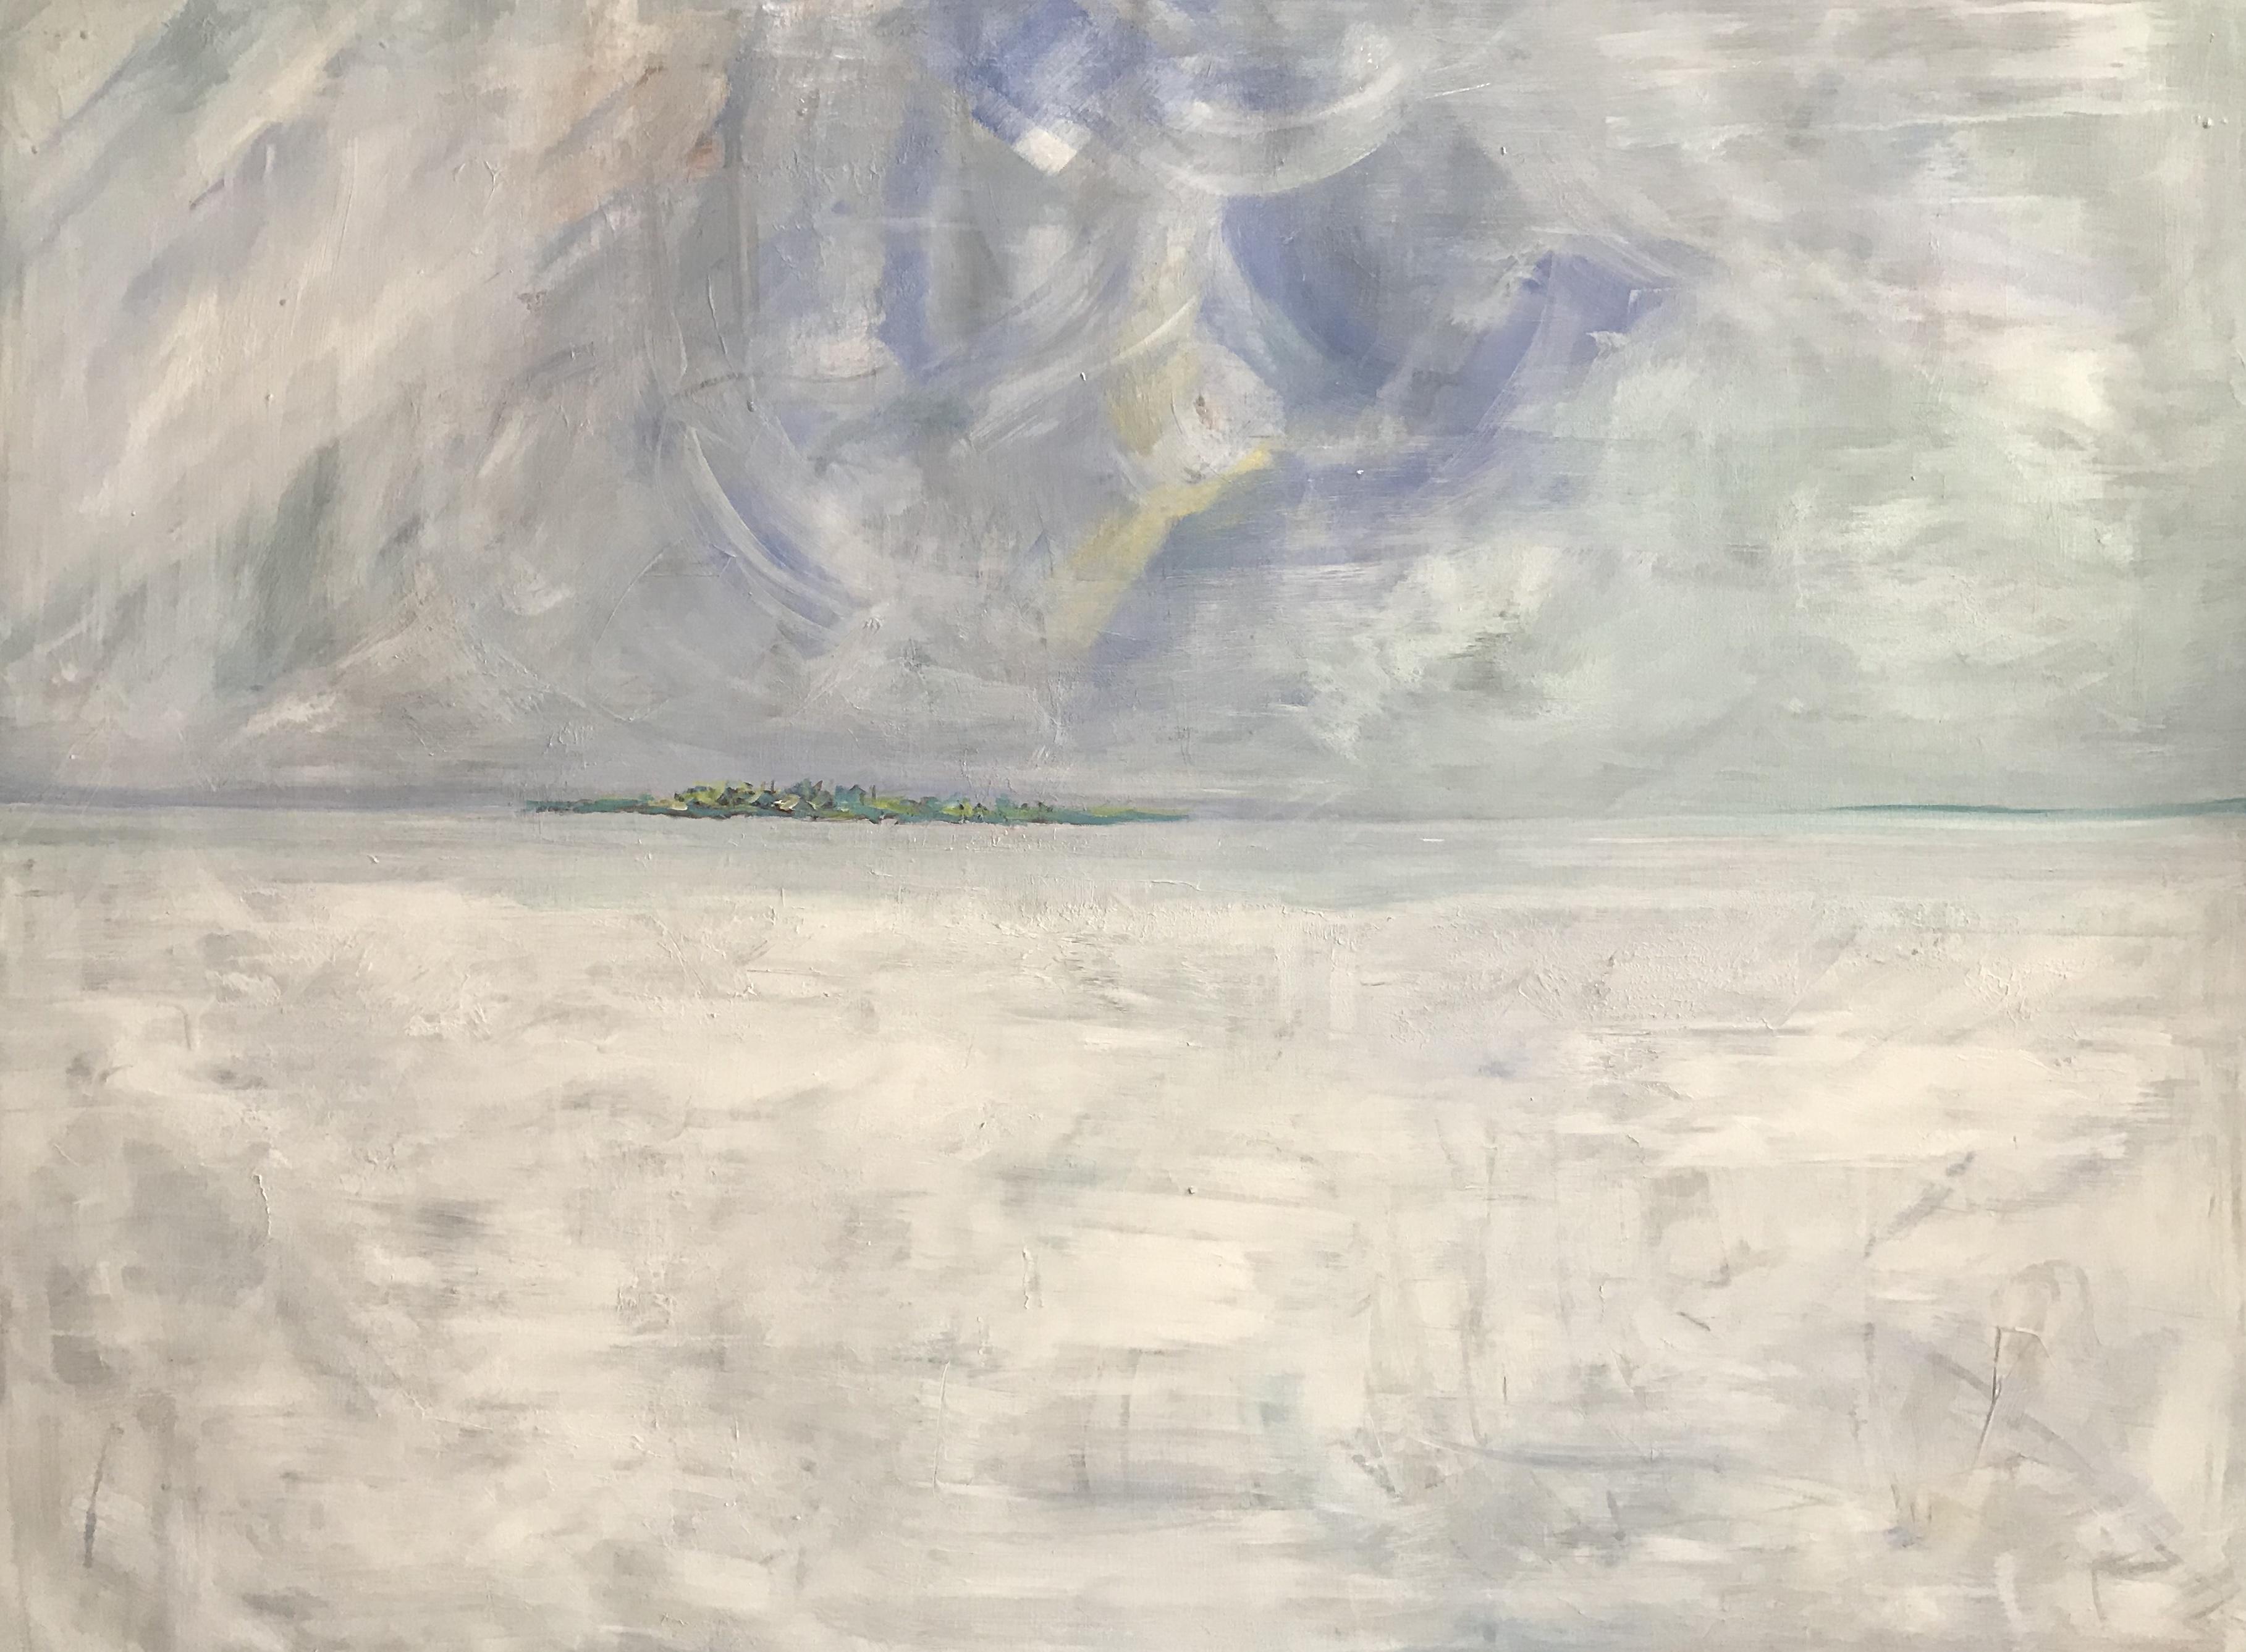 vast emptiness